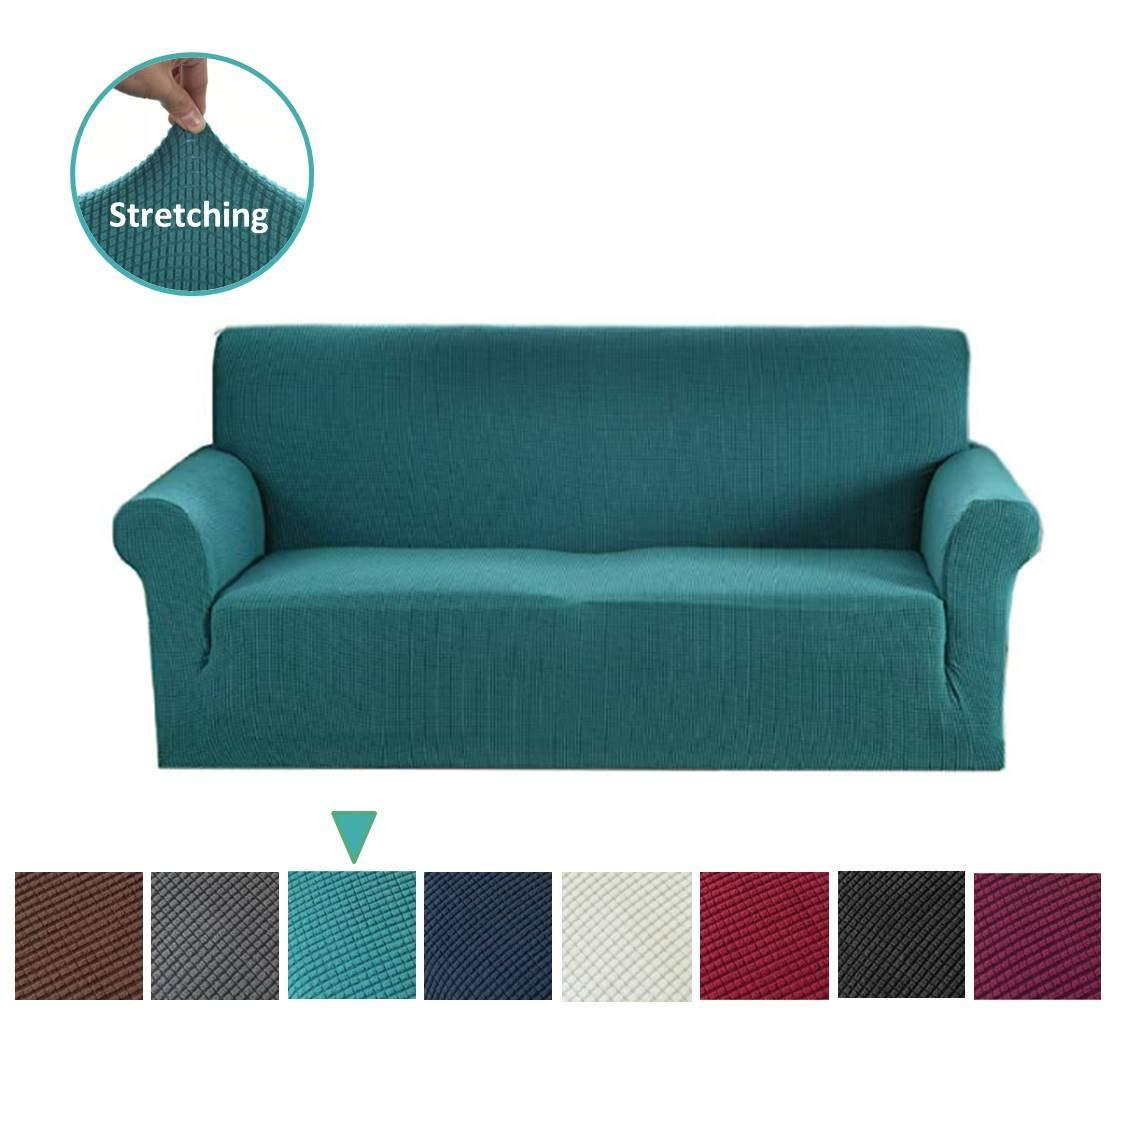 Argstar Jacquard Couch Cover Soft Elastic Sofa Slipcover Cyan by Argstar